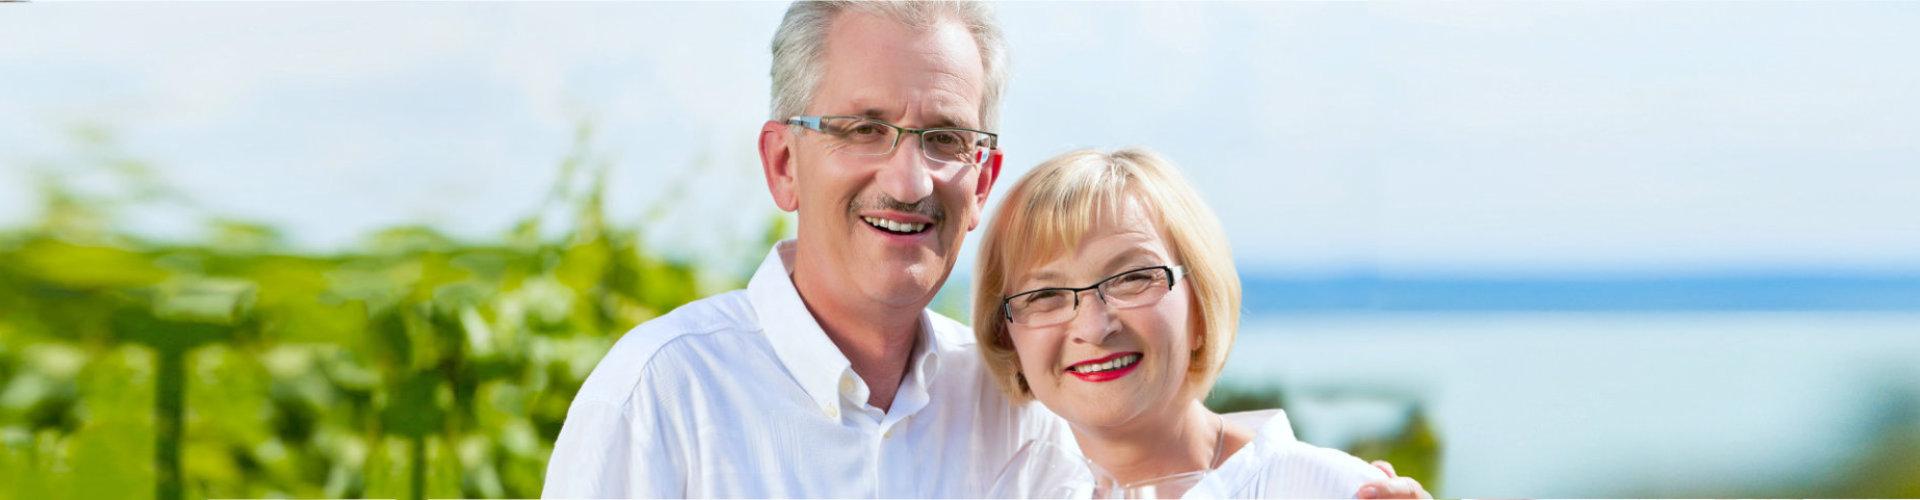 senior couple with glasses